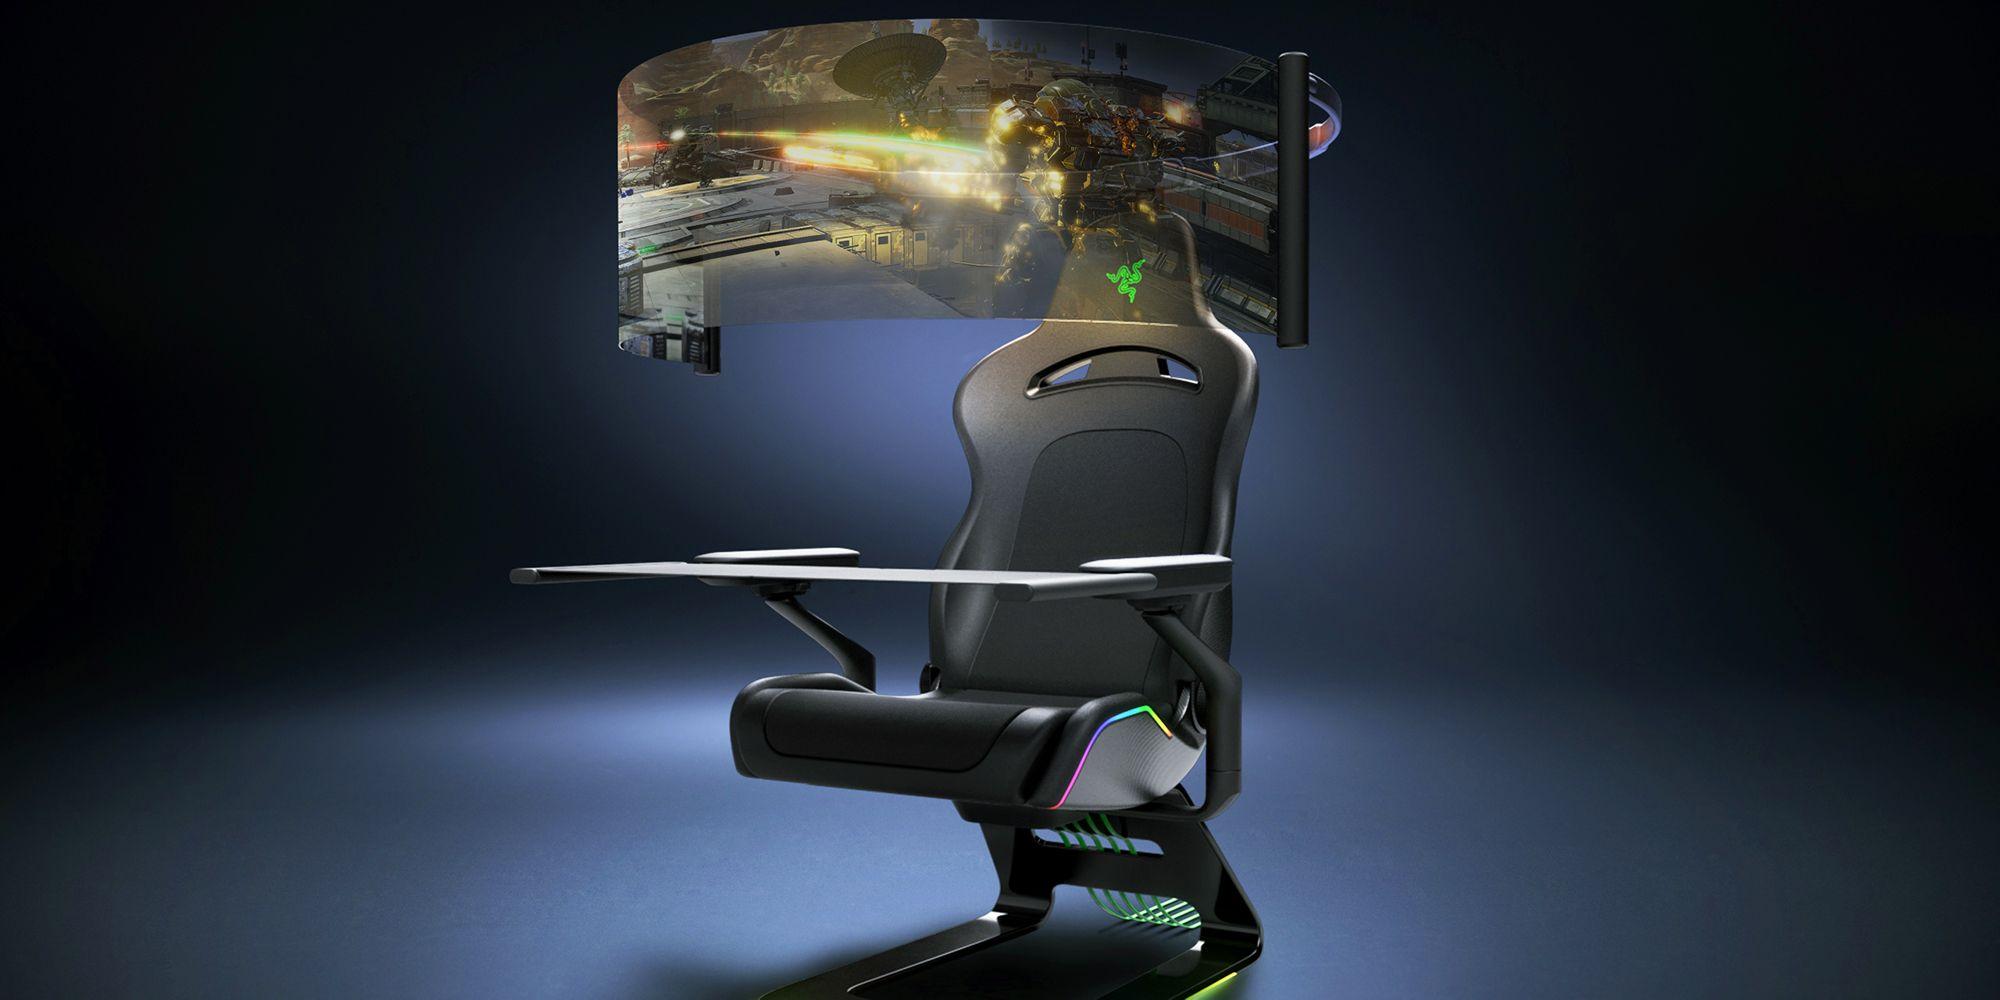 Razer's Futuristic Gaming Chair Concept Has a Flexible Screen Built In